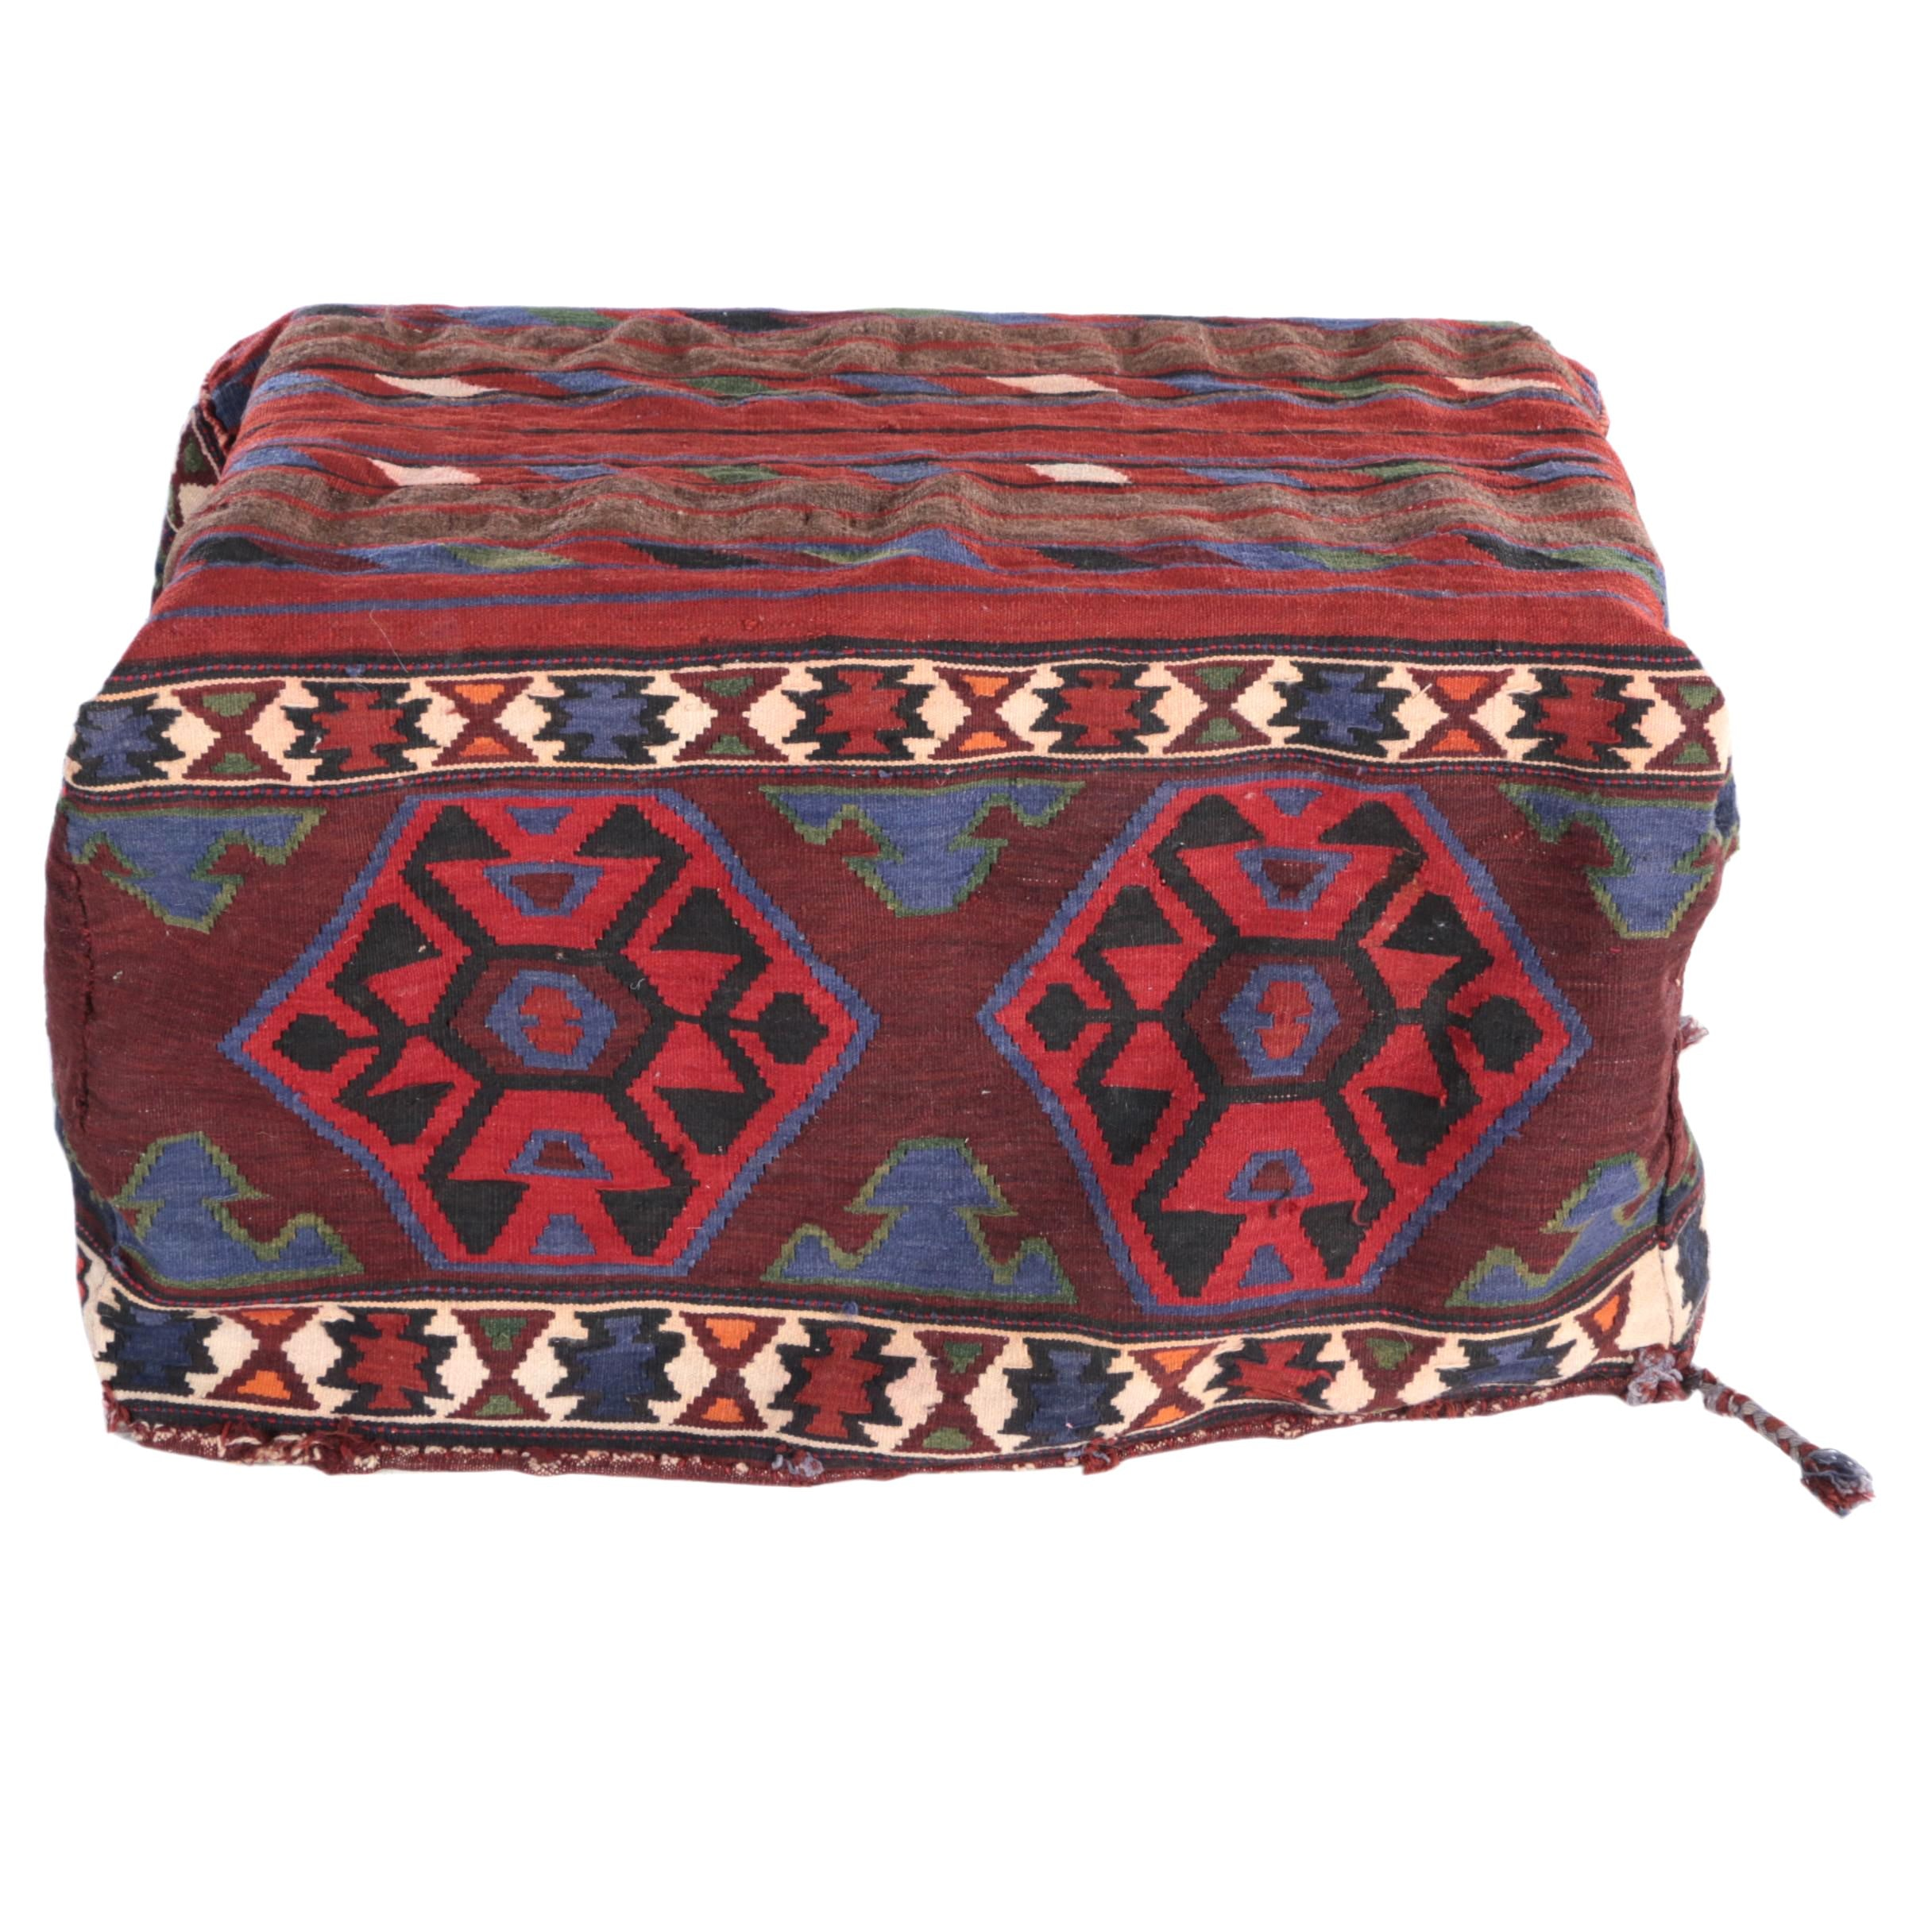 Vintage Handwoven Anatolian Mafrash/Bench Cover